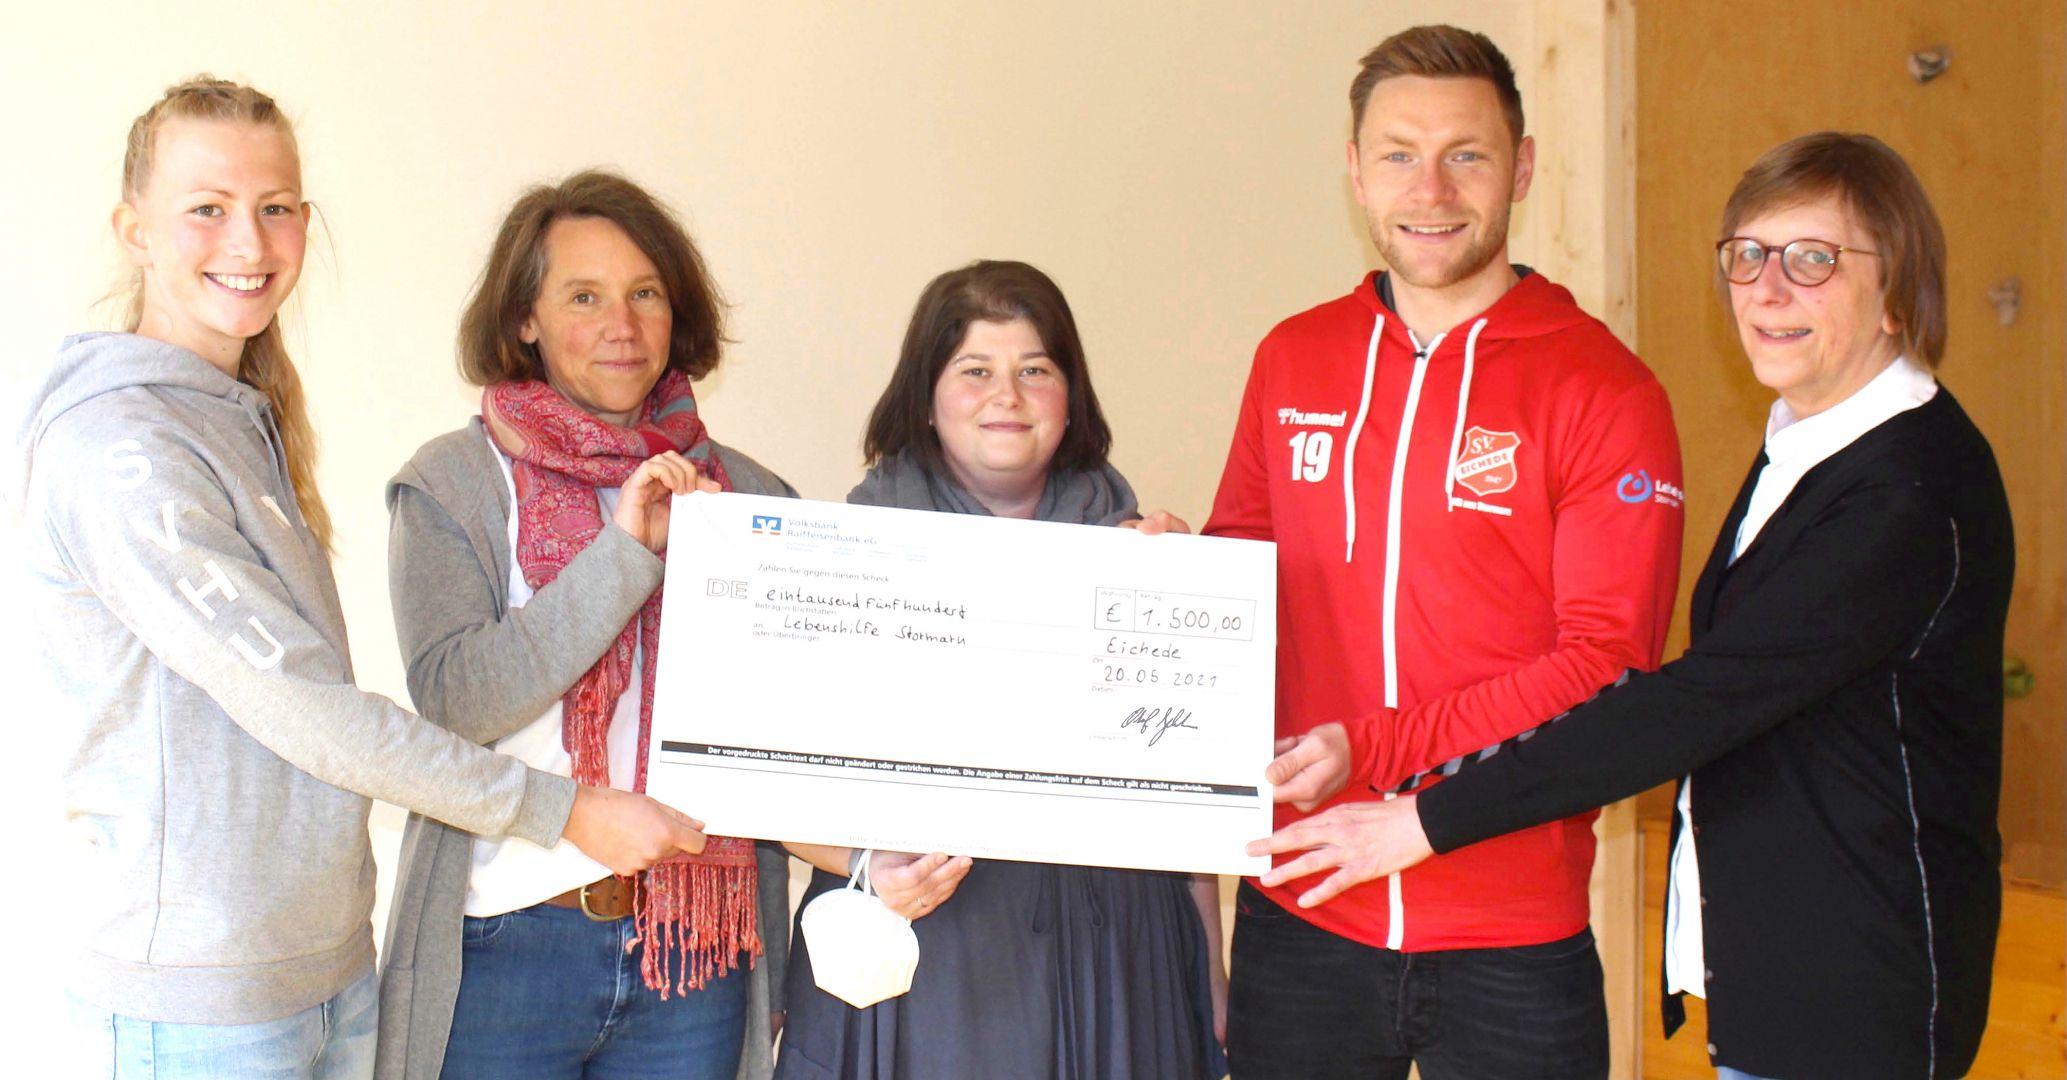 AOK-Social-Ticket: 1500 Euro für die Lebenshilfe Stormarn